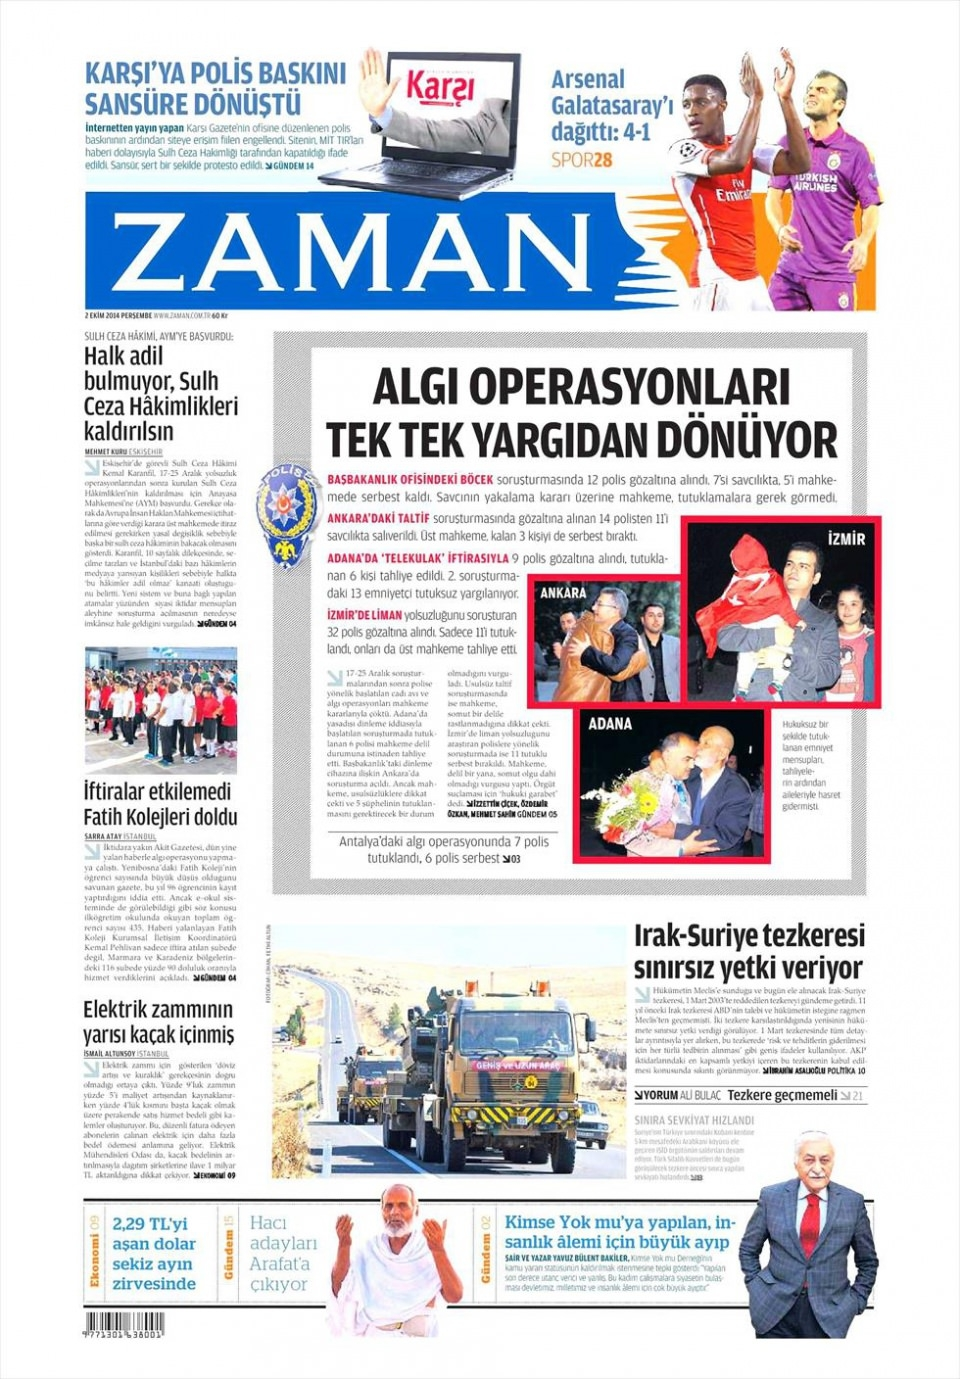 2 Ekim 2014 gazete manşetleri 26